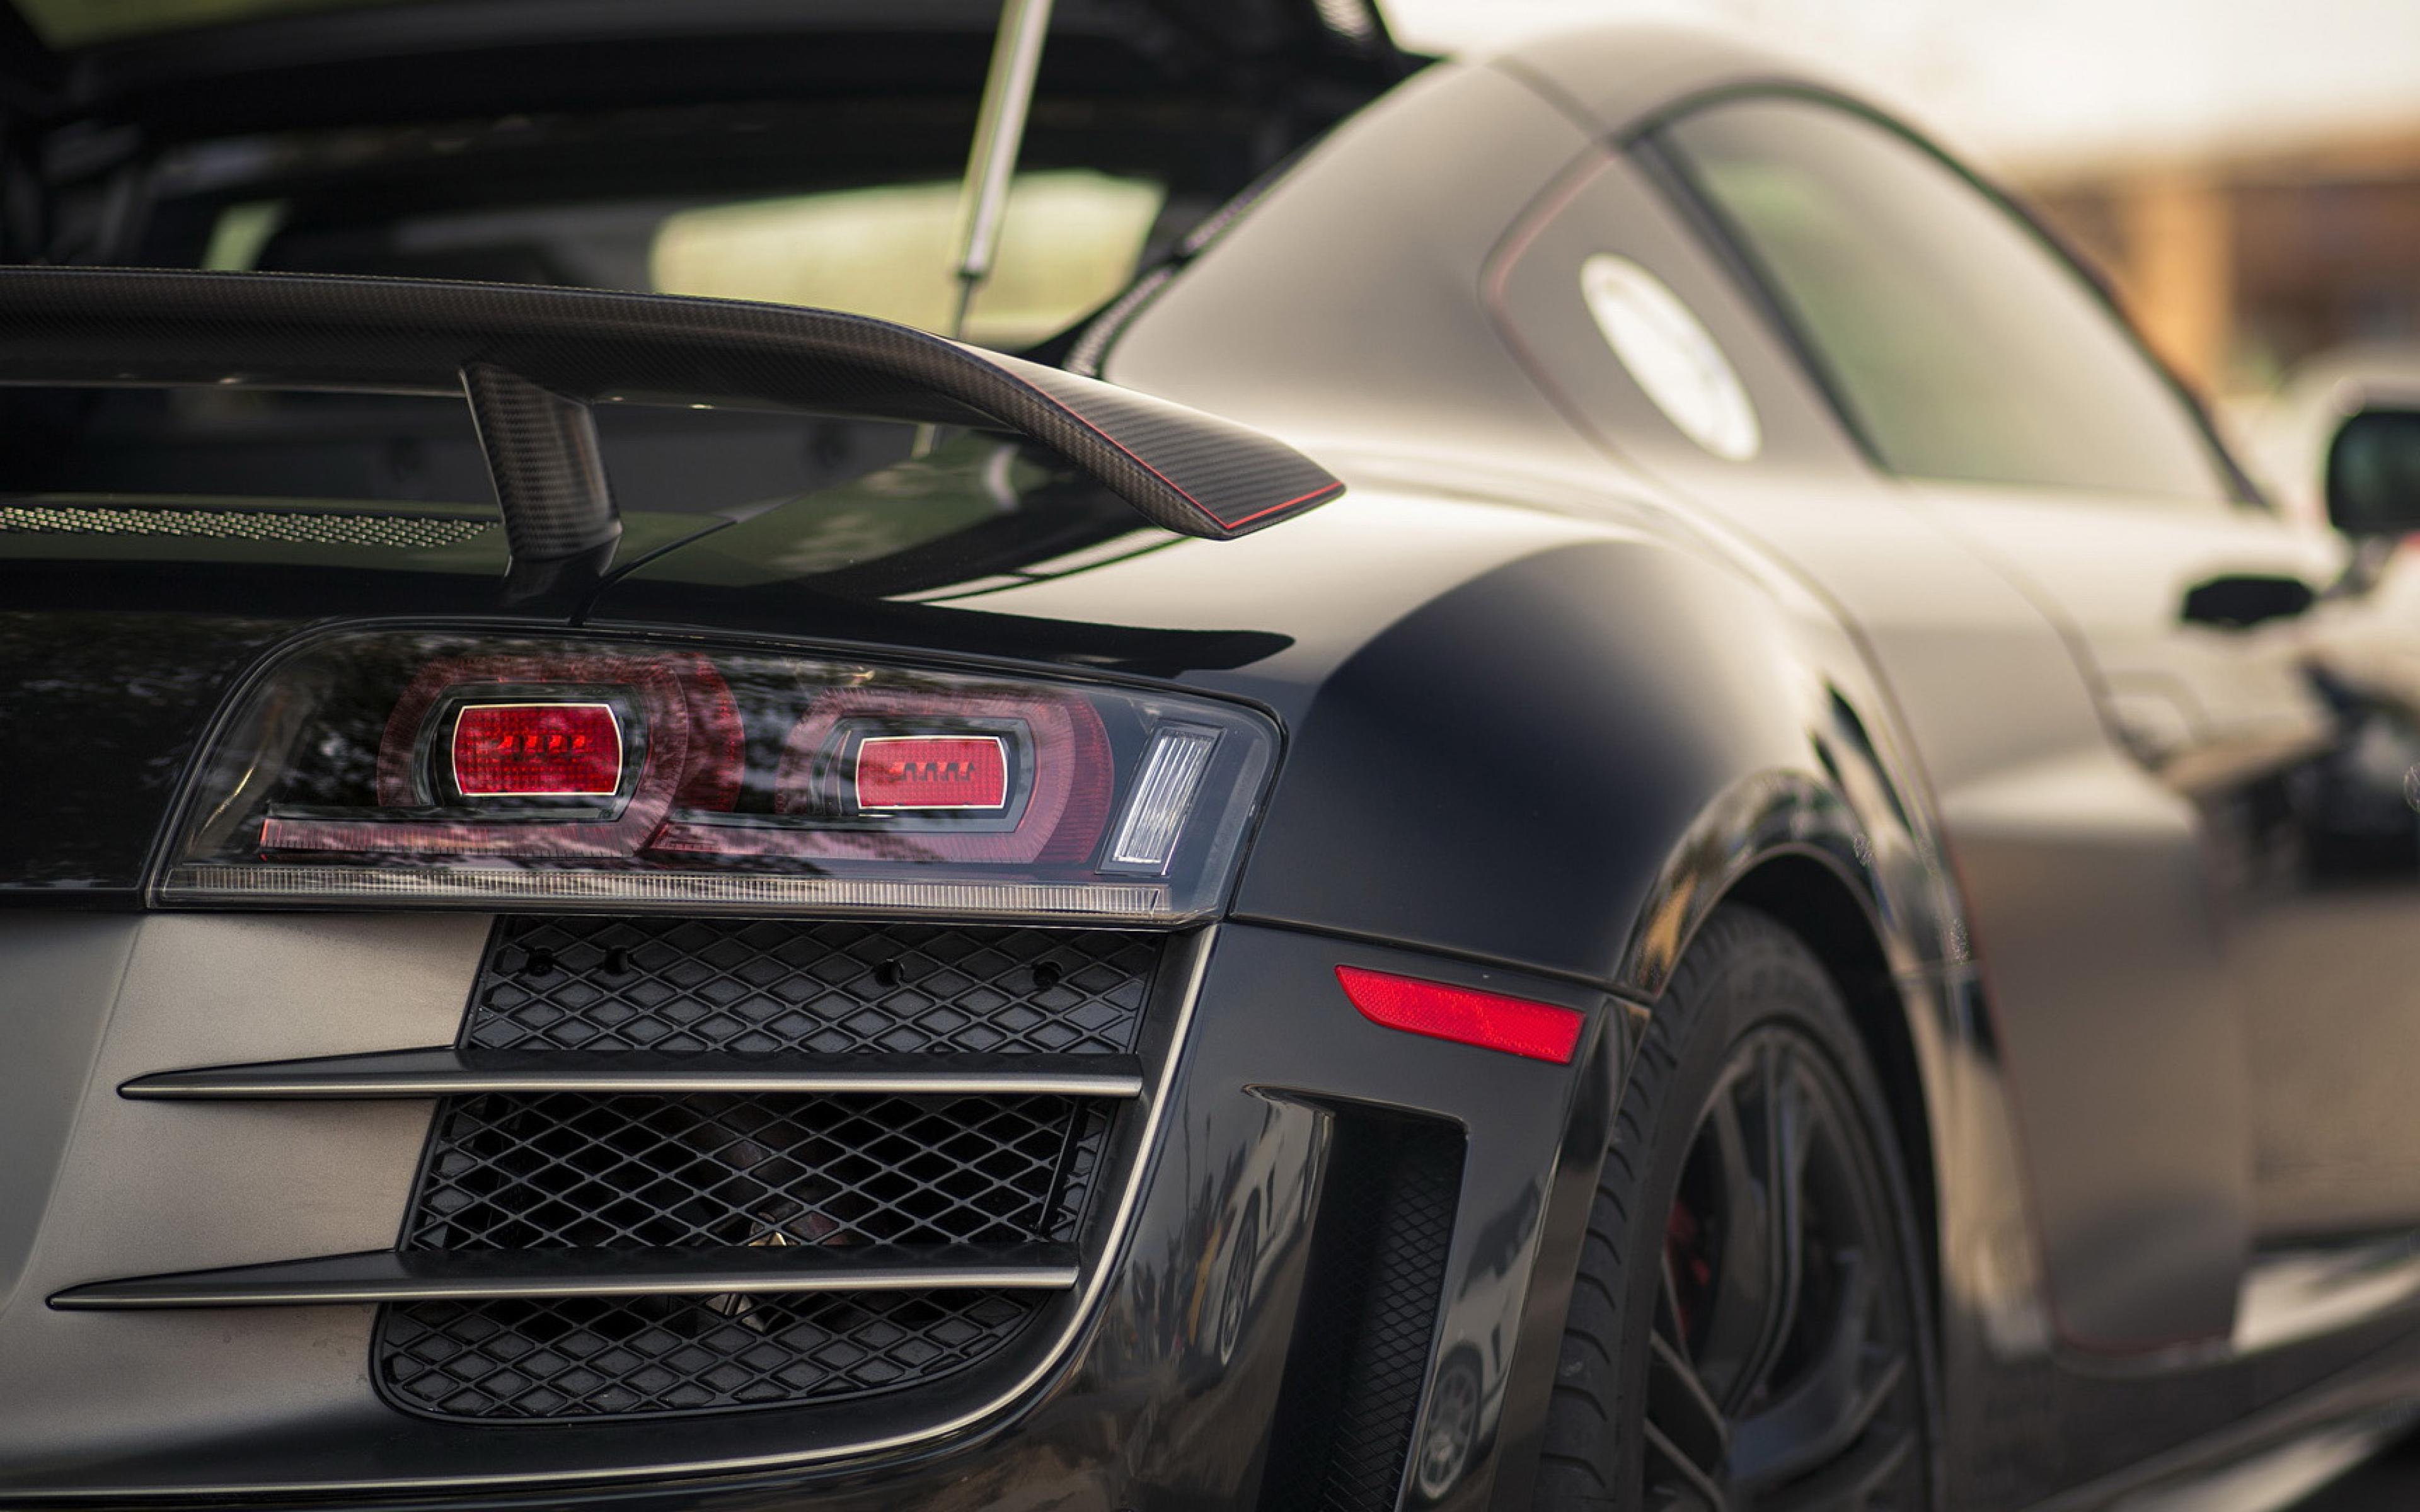 Audi R8 4k Ultra Hd Wallpaper Background Image 3840x2400 Id